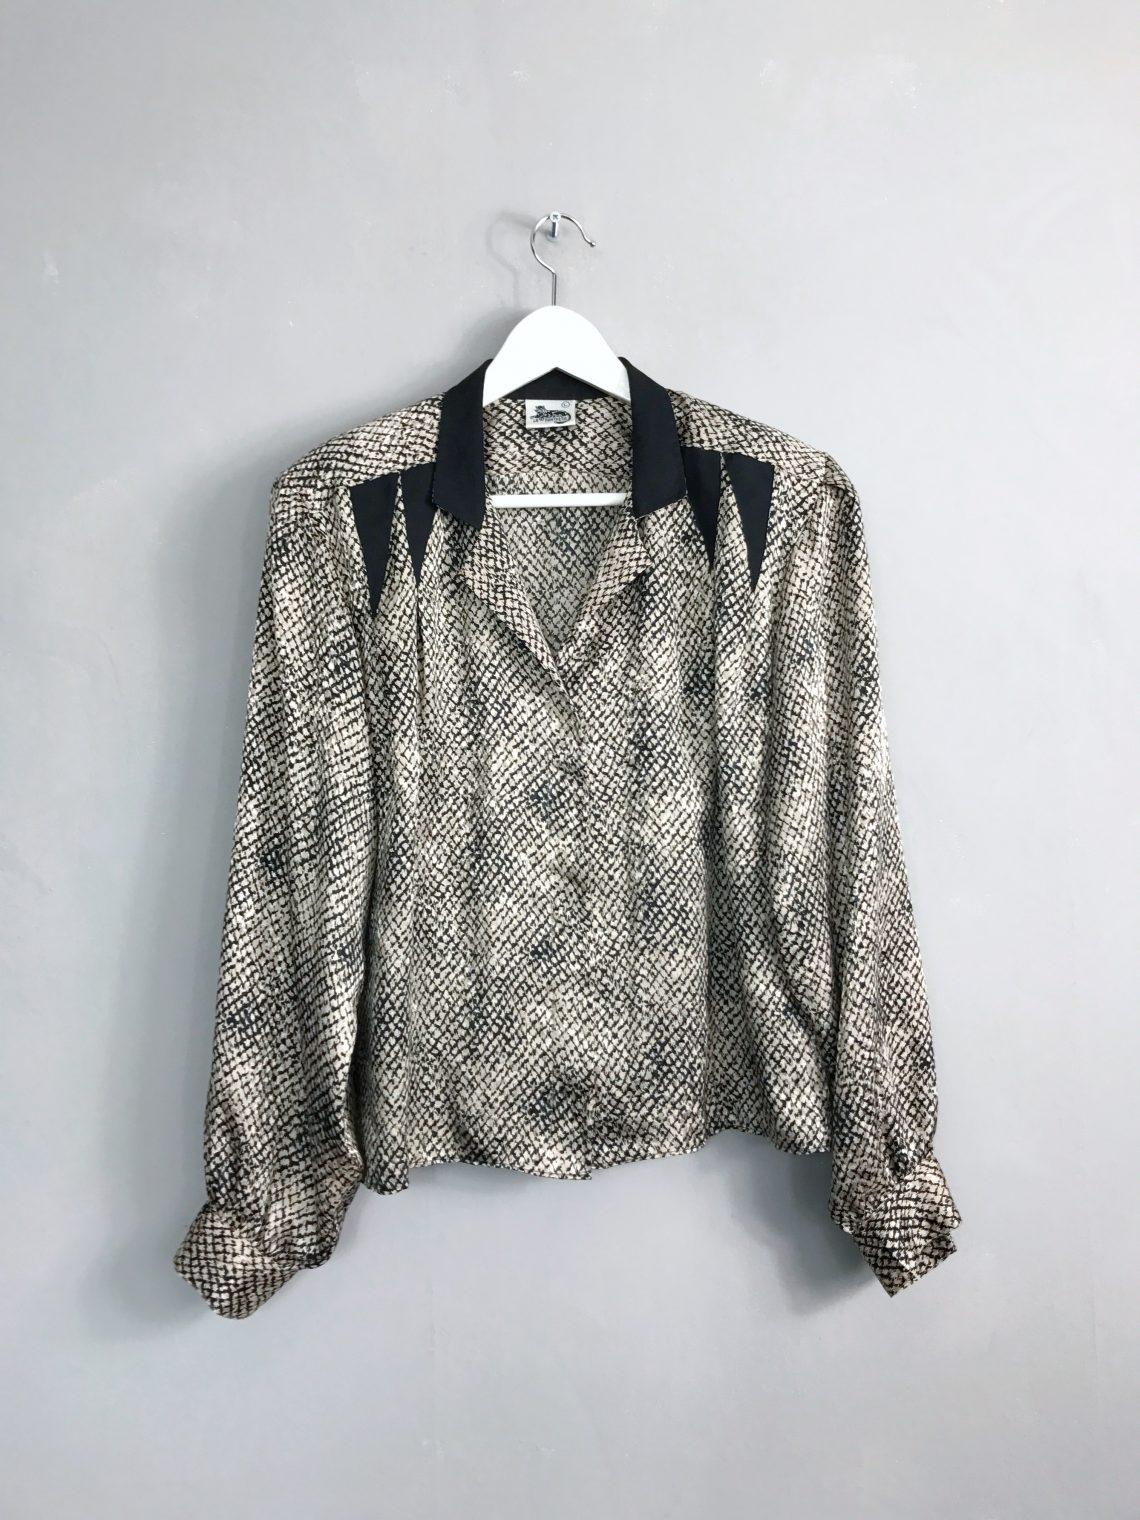 LA PANTHERA Vintage Bluse mit Schulterpolstern